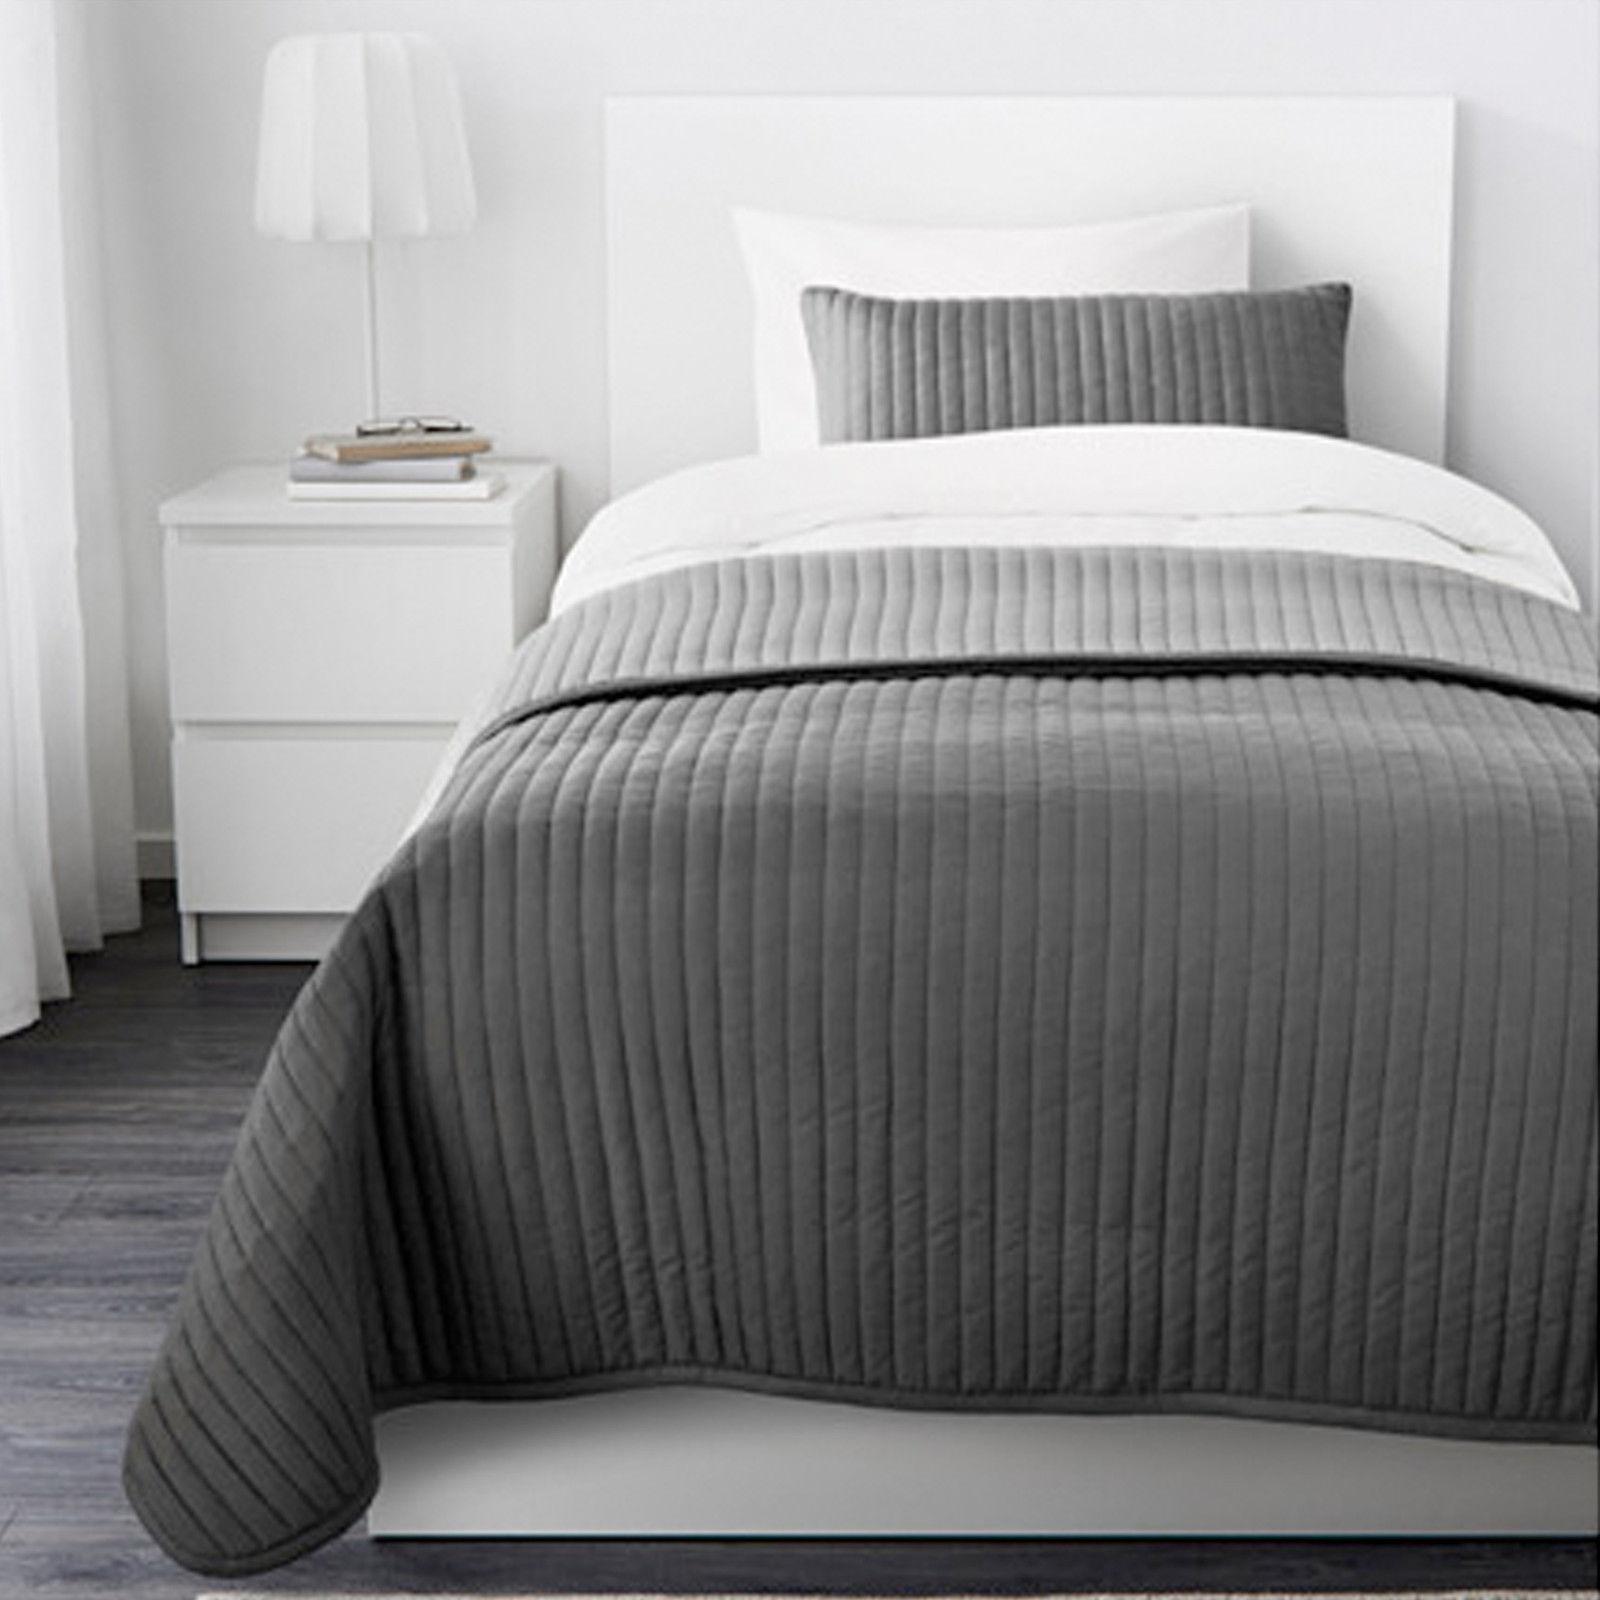 ikea karit tagesdecke 1 kissenbezug grau 180 280 cm einzelbett weich neu ovp traumfabrik xxl. Black Bedroom Furniture Sets. Home Design Ideas